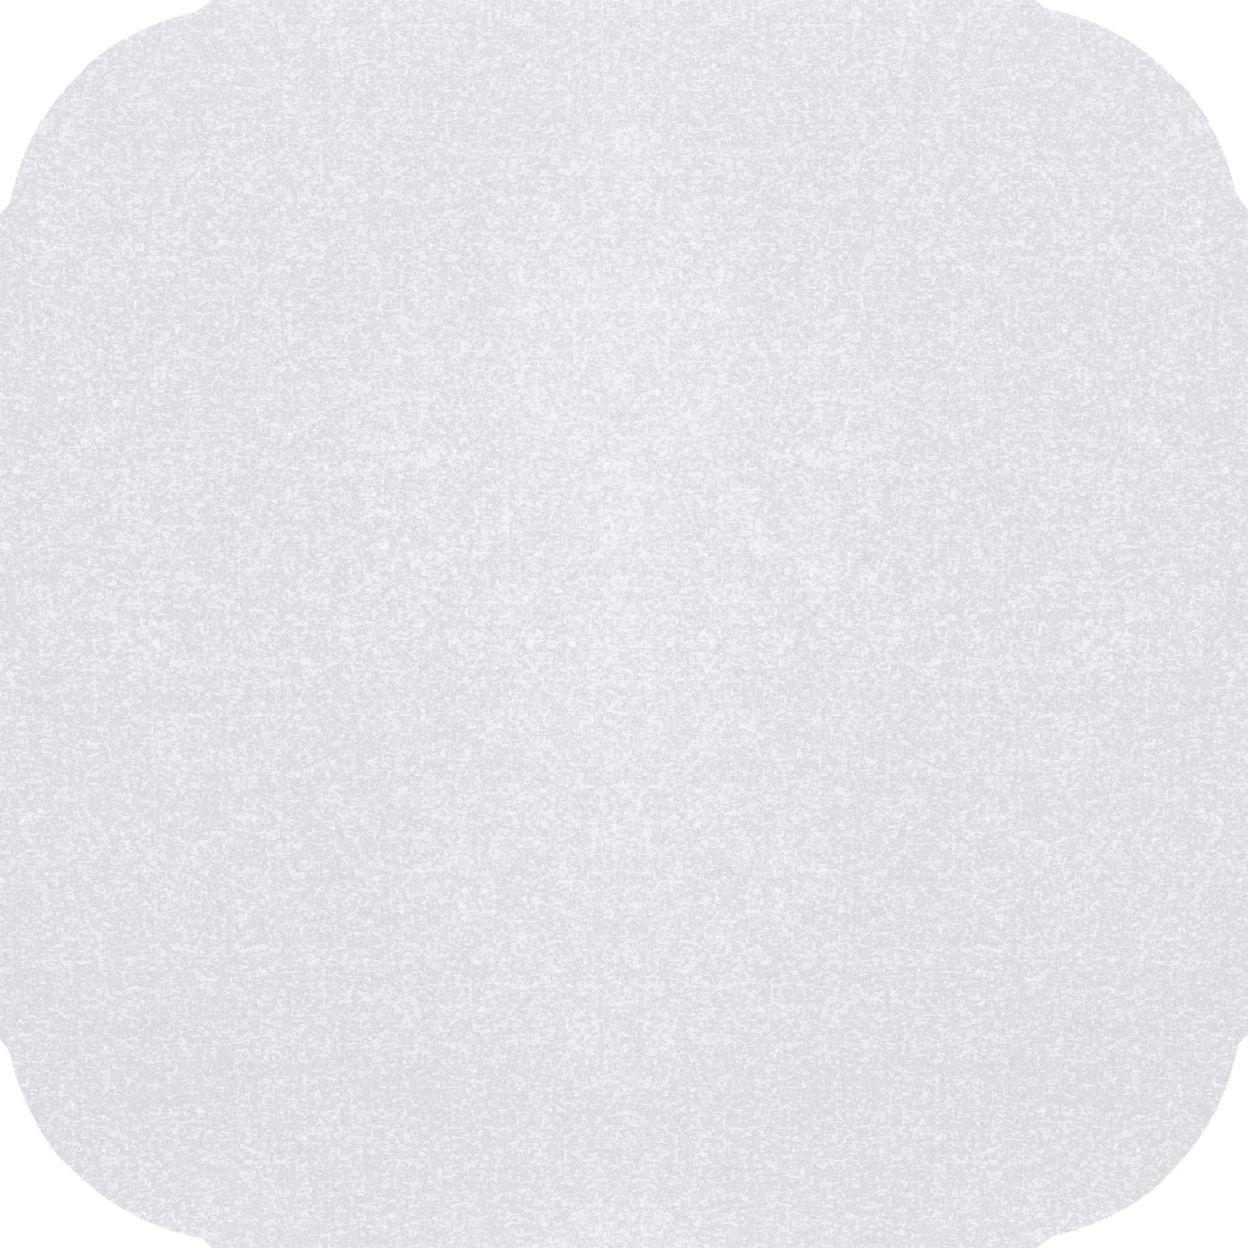 Керамогранит Gracia Ceramica Queen 450х450х8 мм белый 01 (8 шт=1,62 кв.м) цена 2017